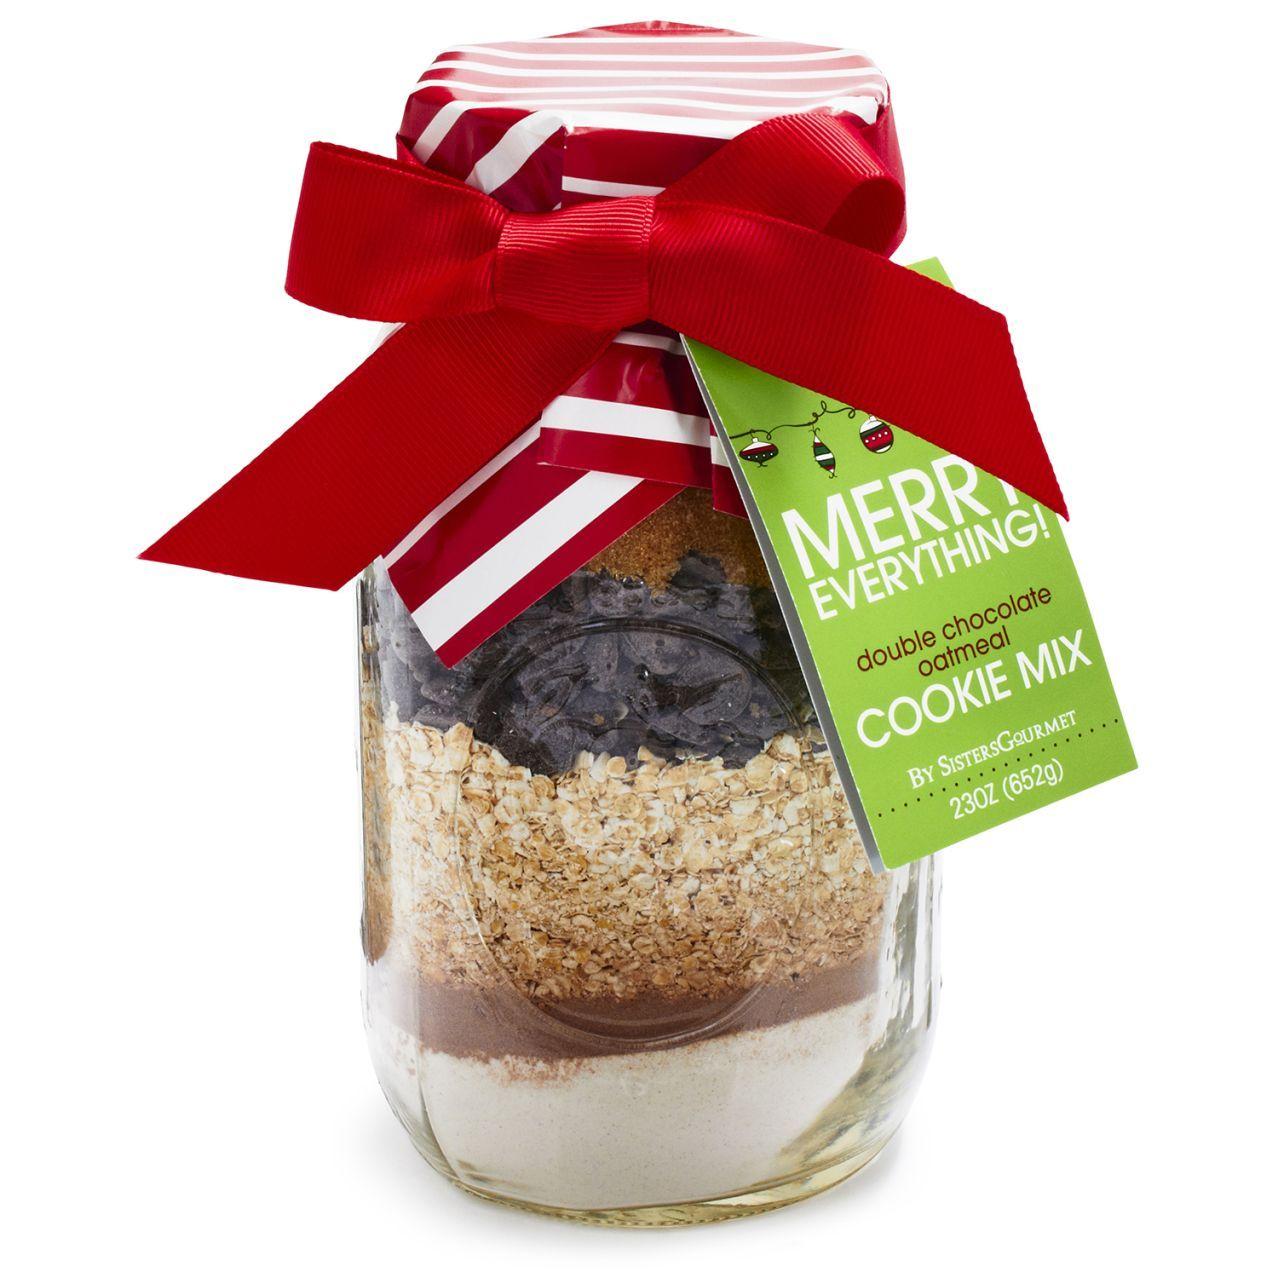 Sistersu0027 Gourmet Merry Everything Cookie Mix | Sur La Table